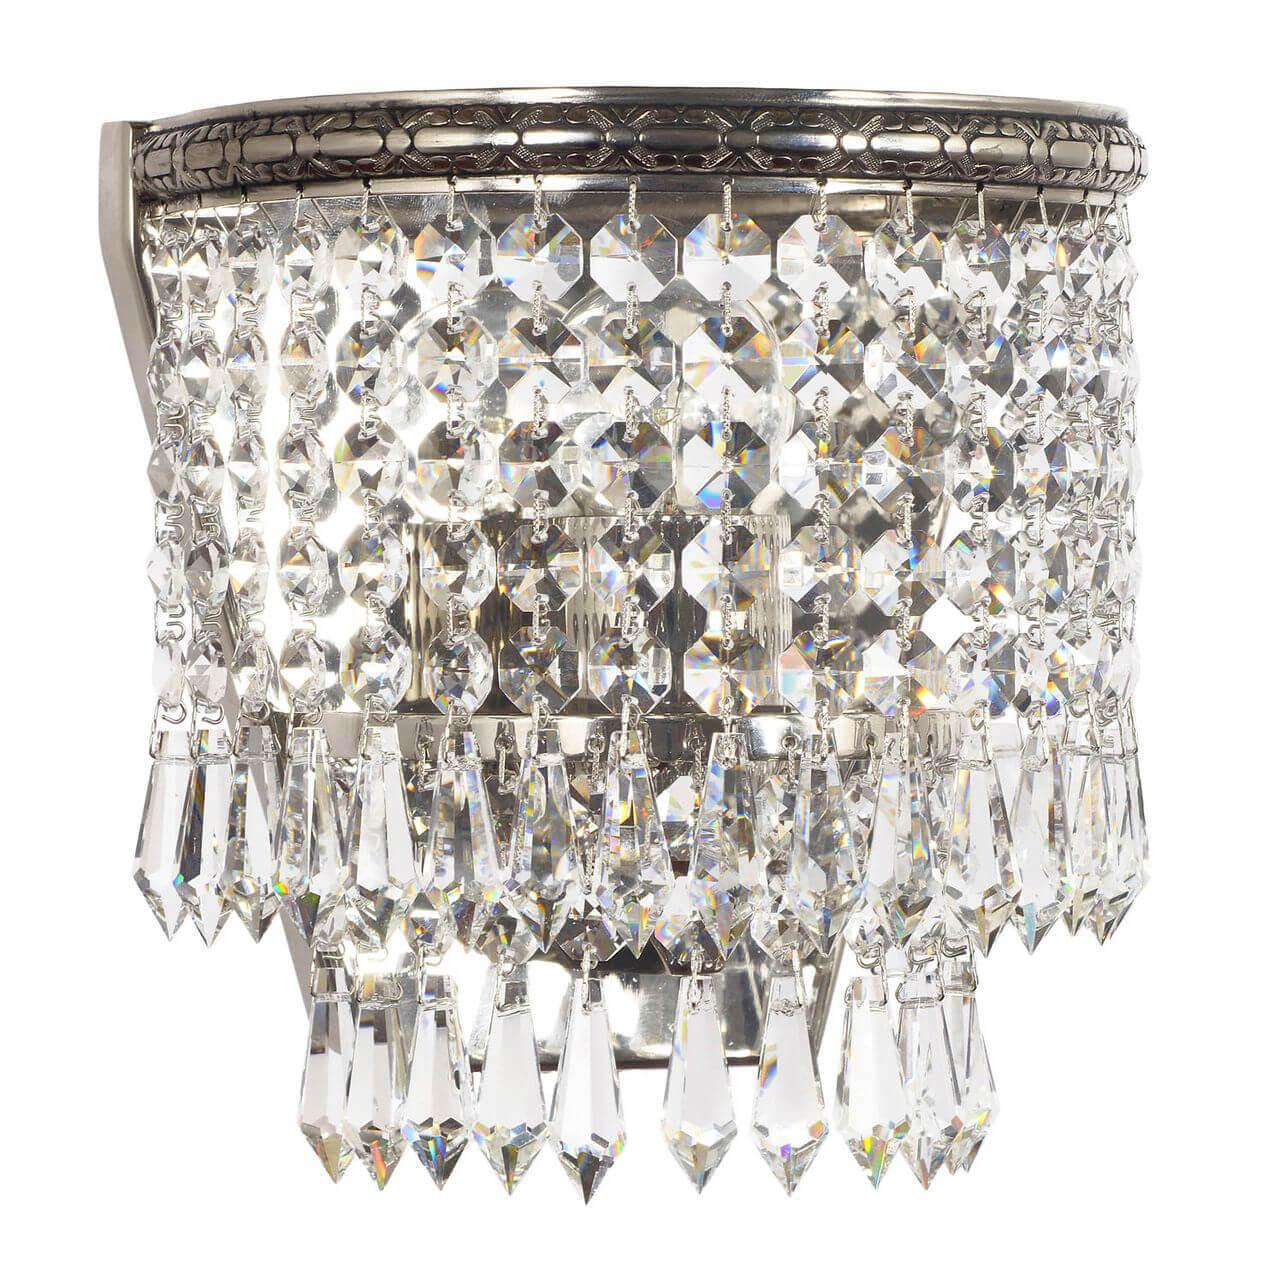 Светильник Arti Lampadari Eterno E 2.10.600 NH Eterno NH цена 2017